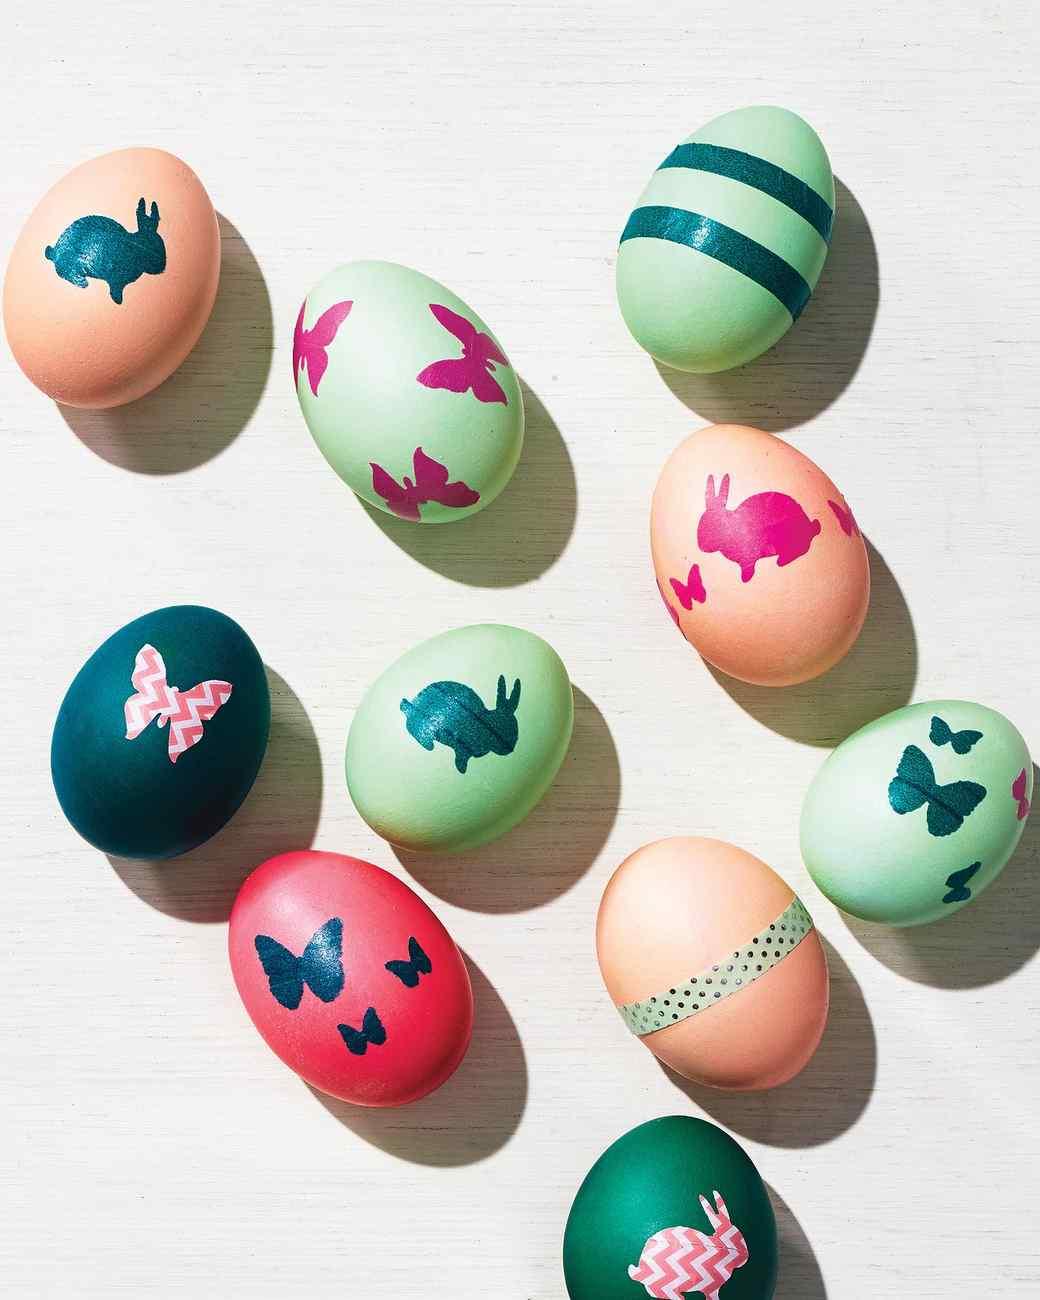 washi-tape-eggs-686-d112656.jpg